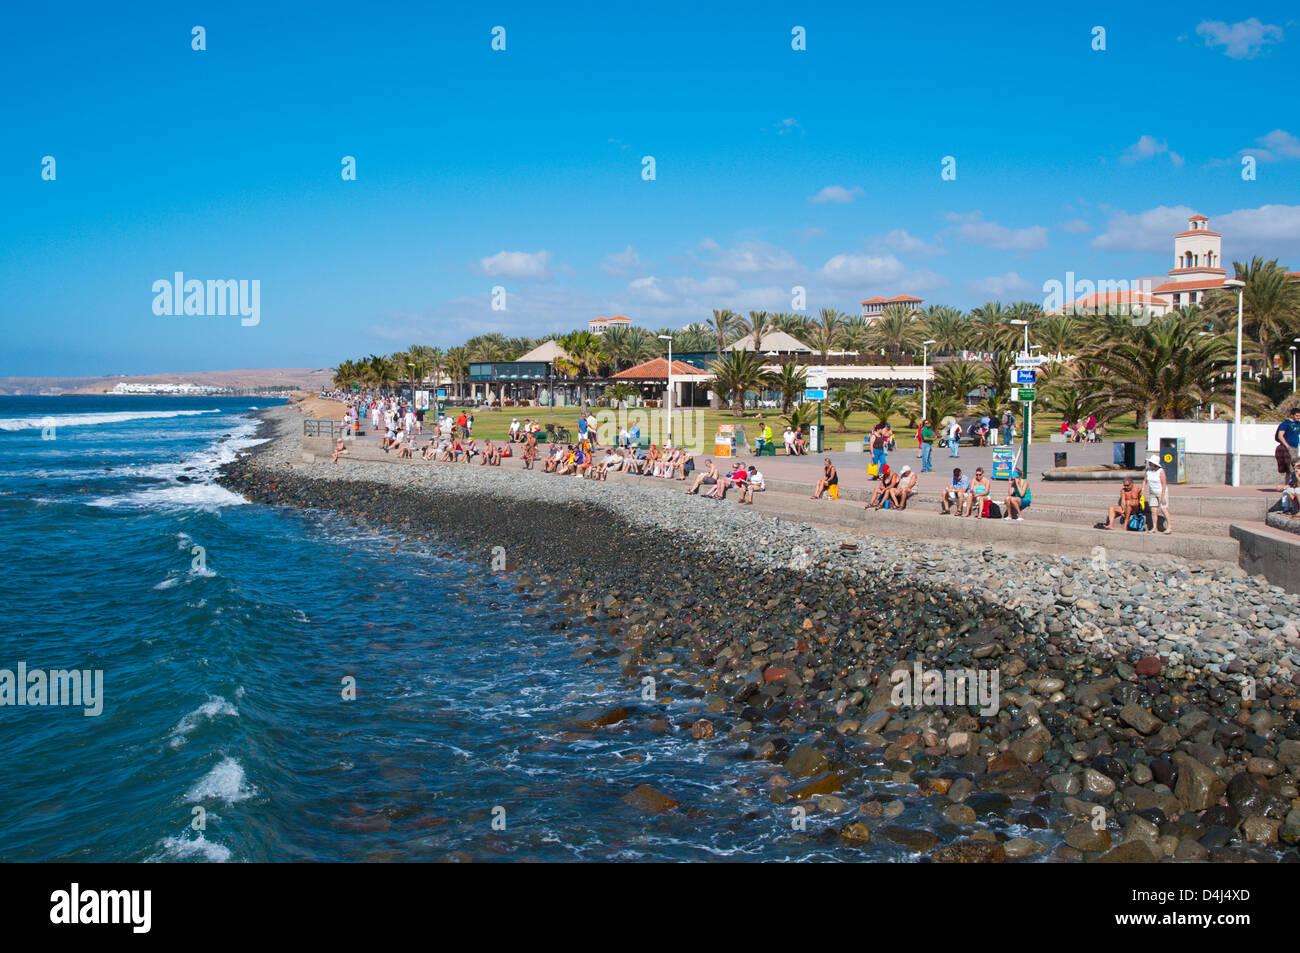 Maspalomas Resort Gran Canaria Insel der Kanarischen Inseln-Spanien-Europa Stockbild